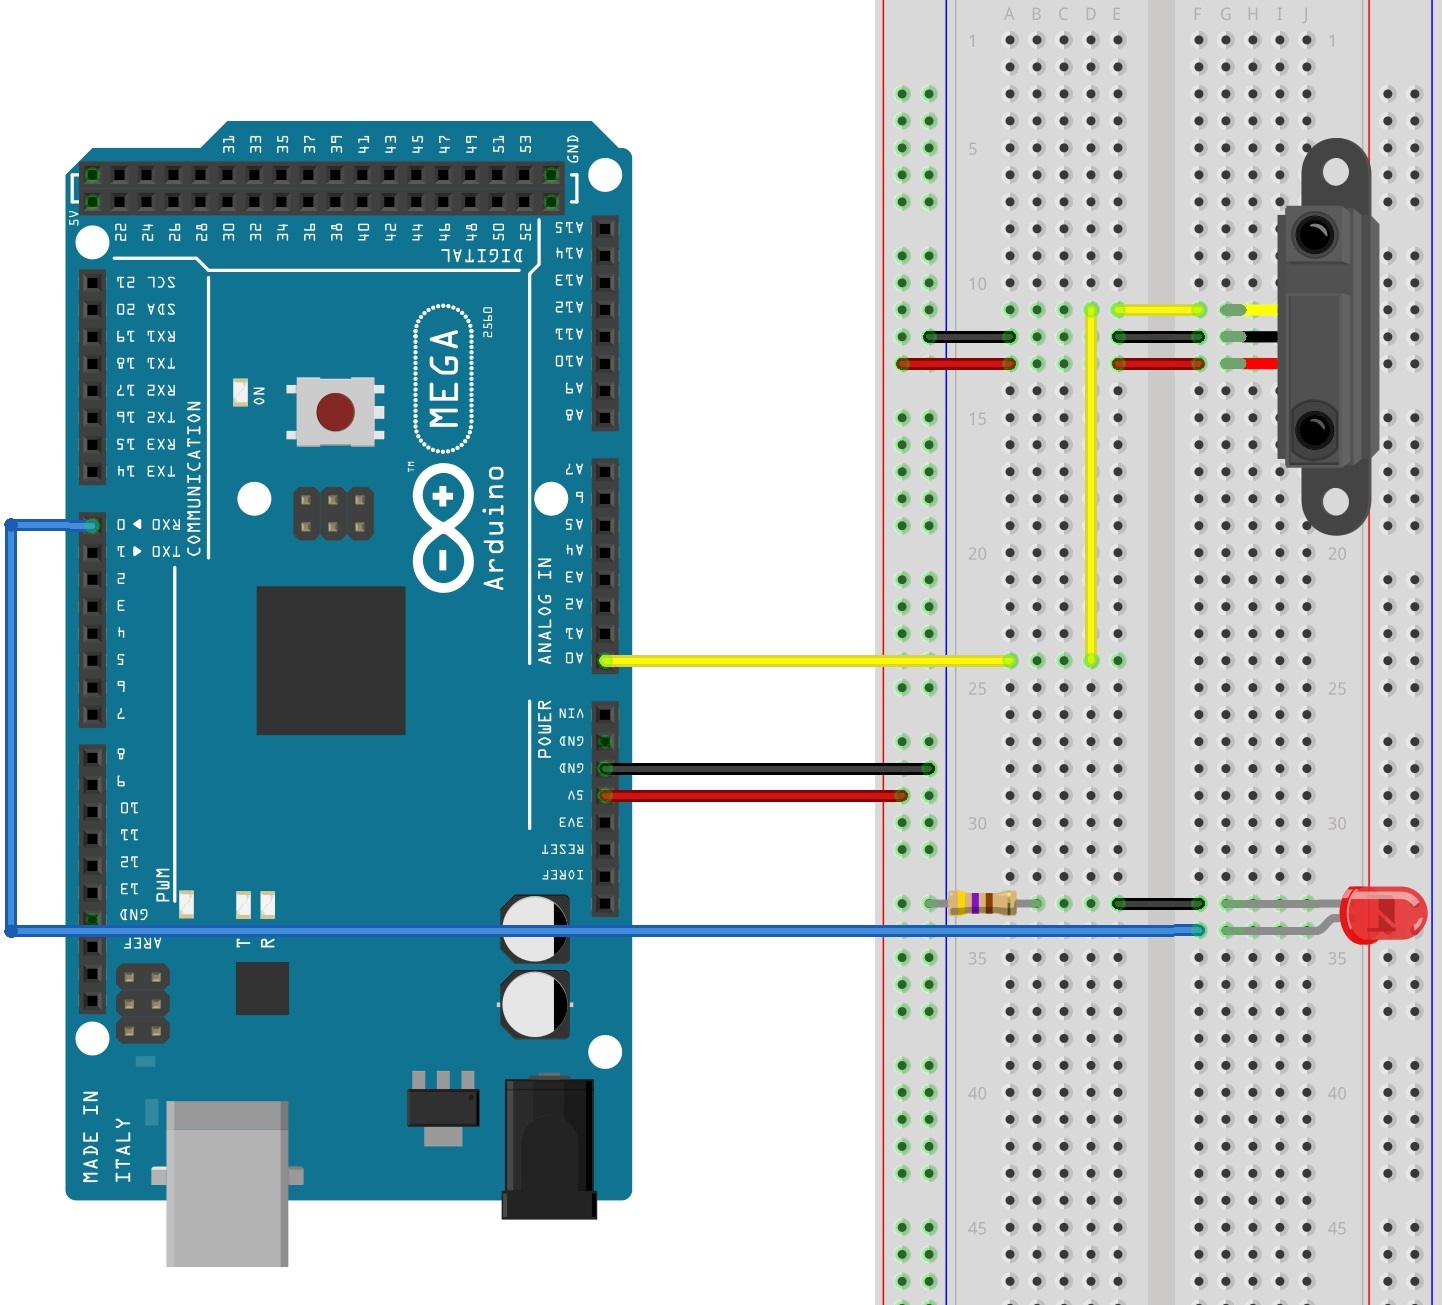 small resolution of inductive proximity sensor wiring diagram pinout wiring diagraminductive proximity sensor wiring diagram pinout wiring librarycircuit diagram